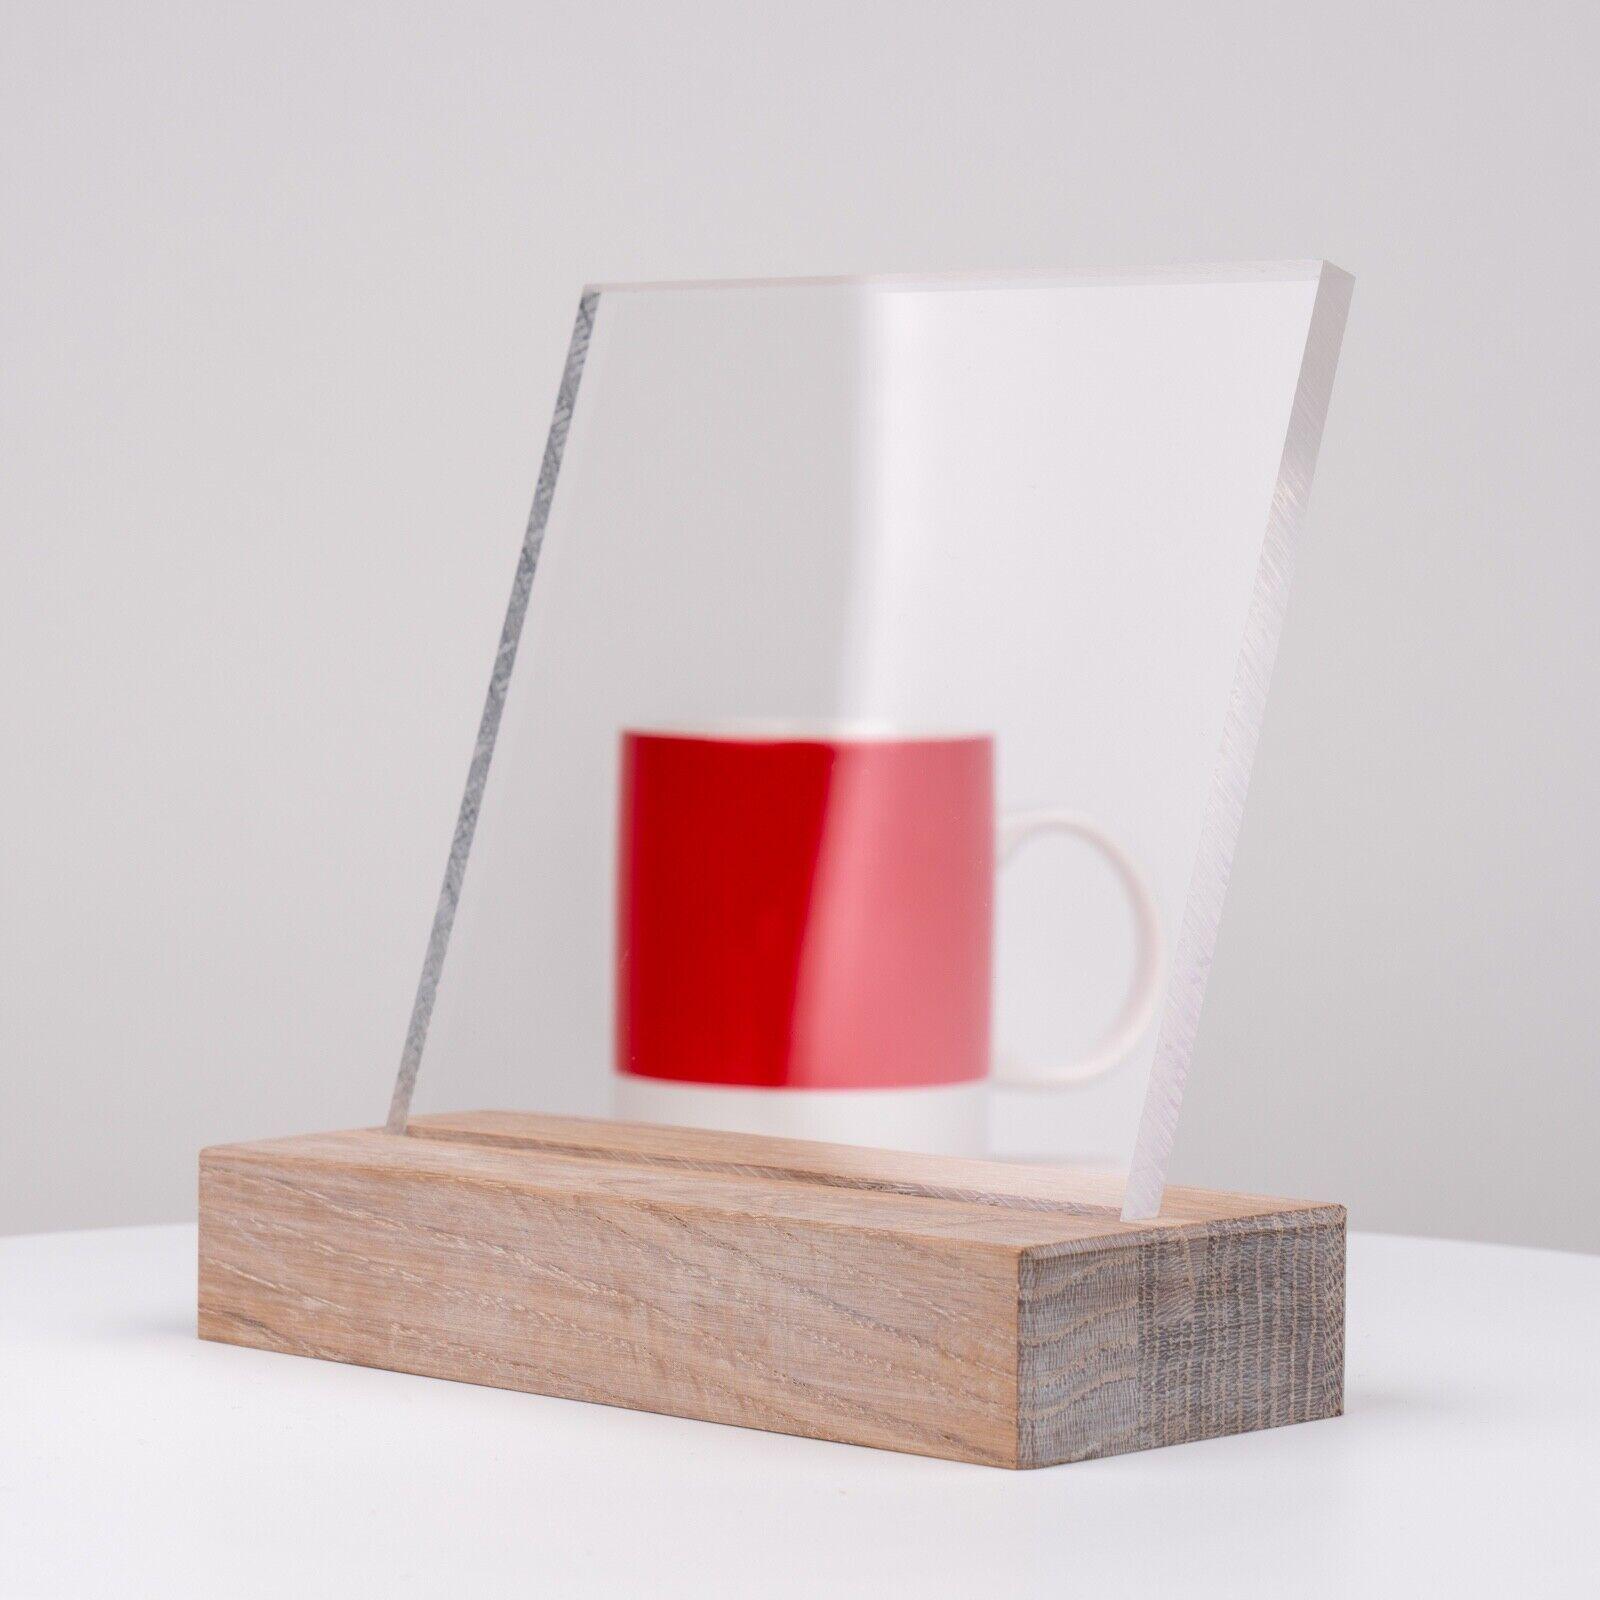 3mm transparent Polymethylmethacrylat Acrylglas A3 Zuschnitt 420mm x 297mm